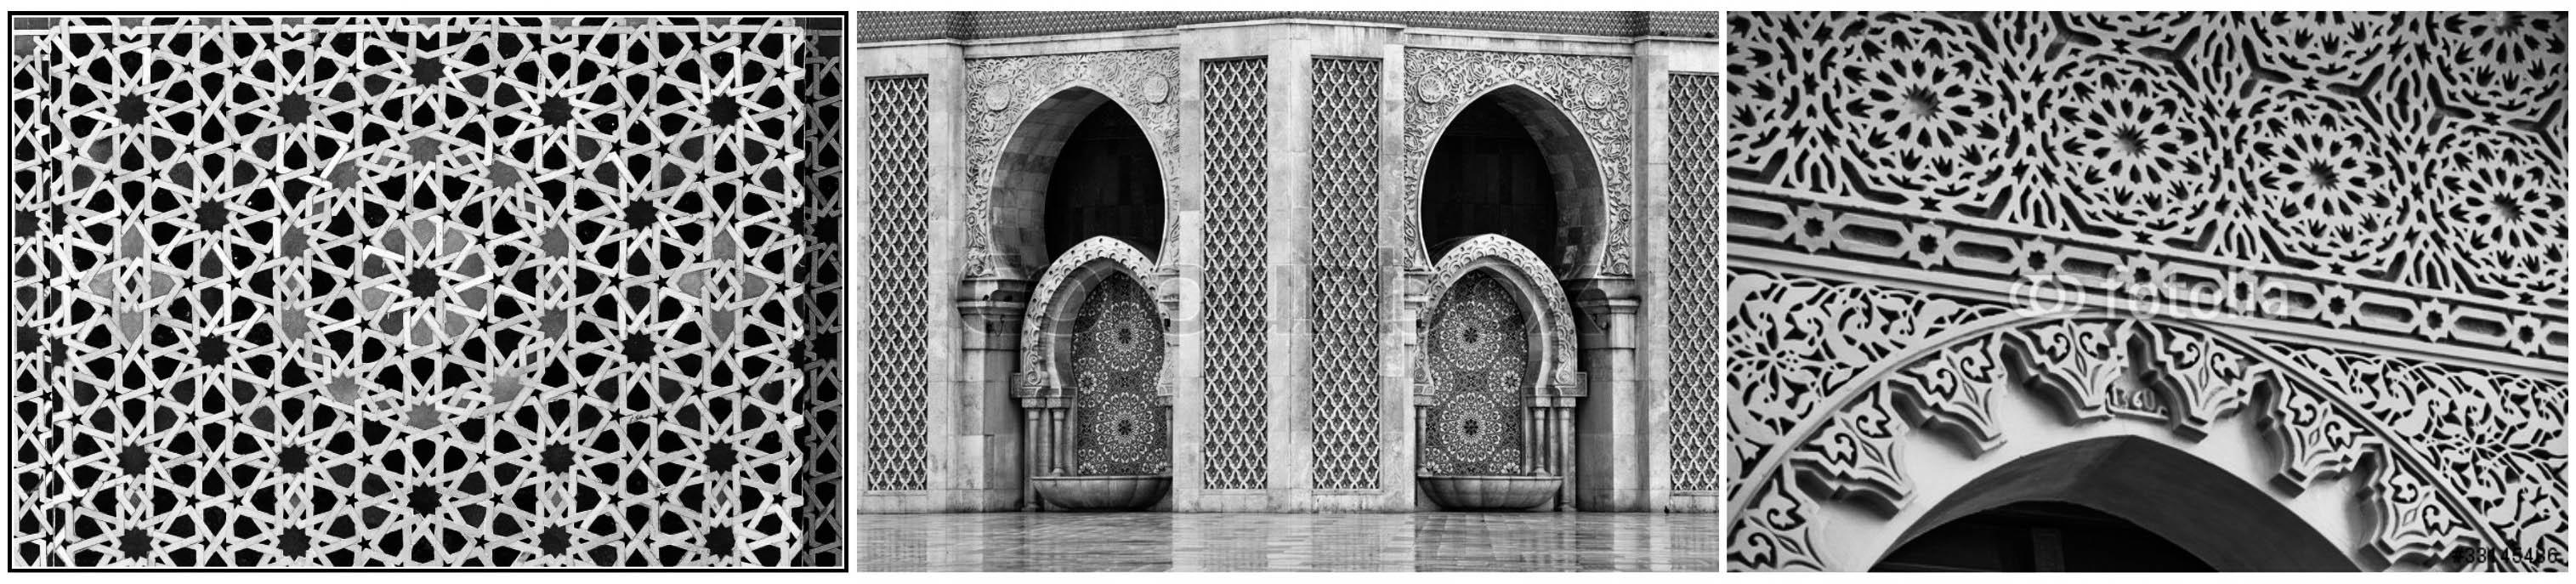 ornamen masjid ornamen geometris islami